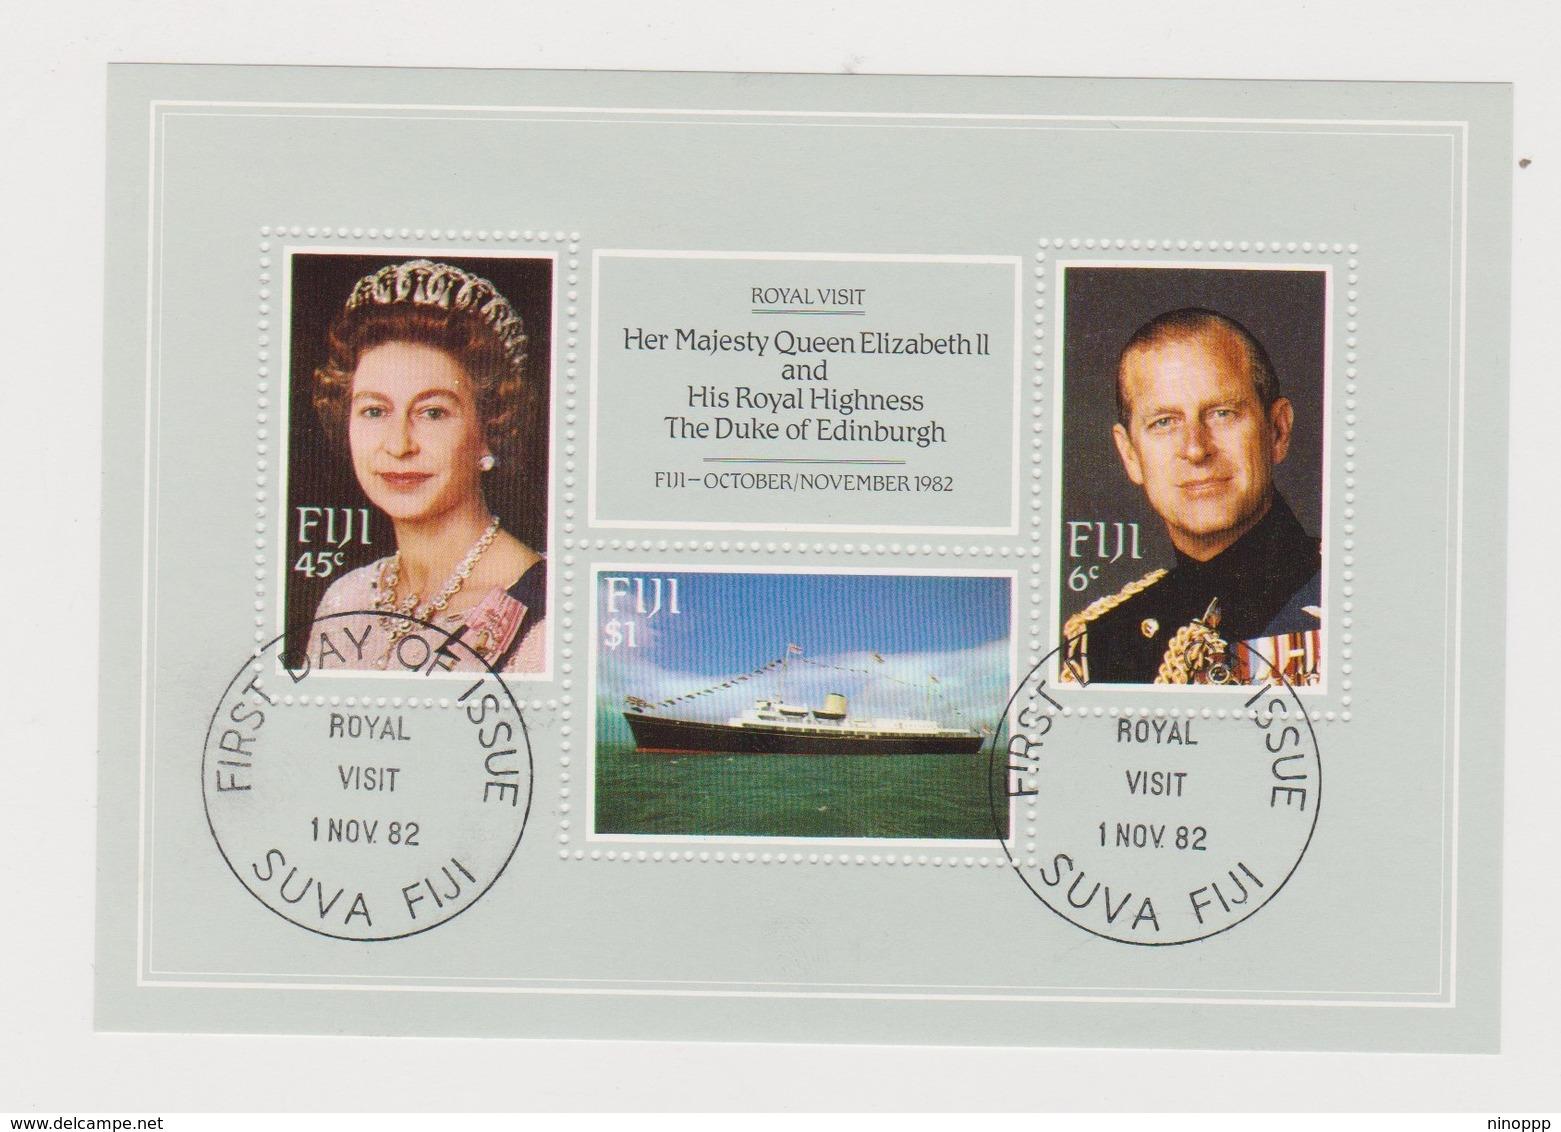 Fiji SG MS 646 1982 Royal Visit ,Miniature Sheet,used - Fiji (1970-...)